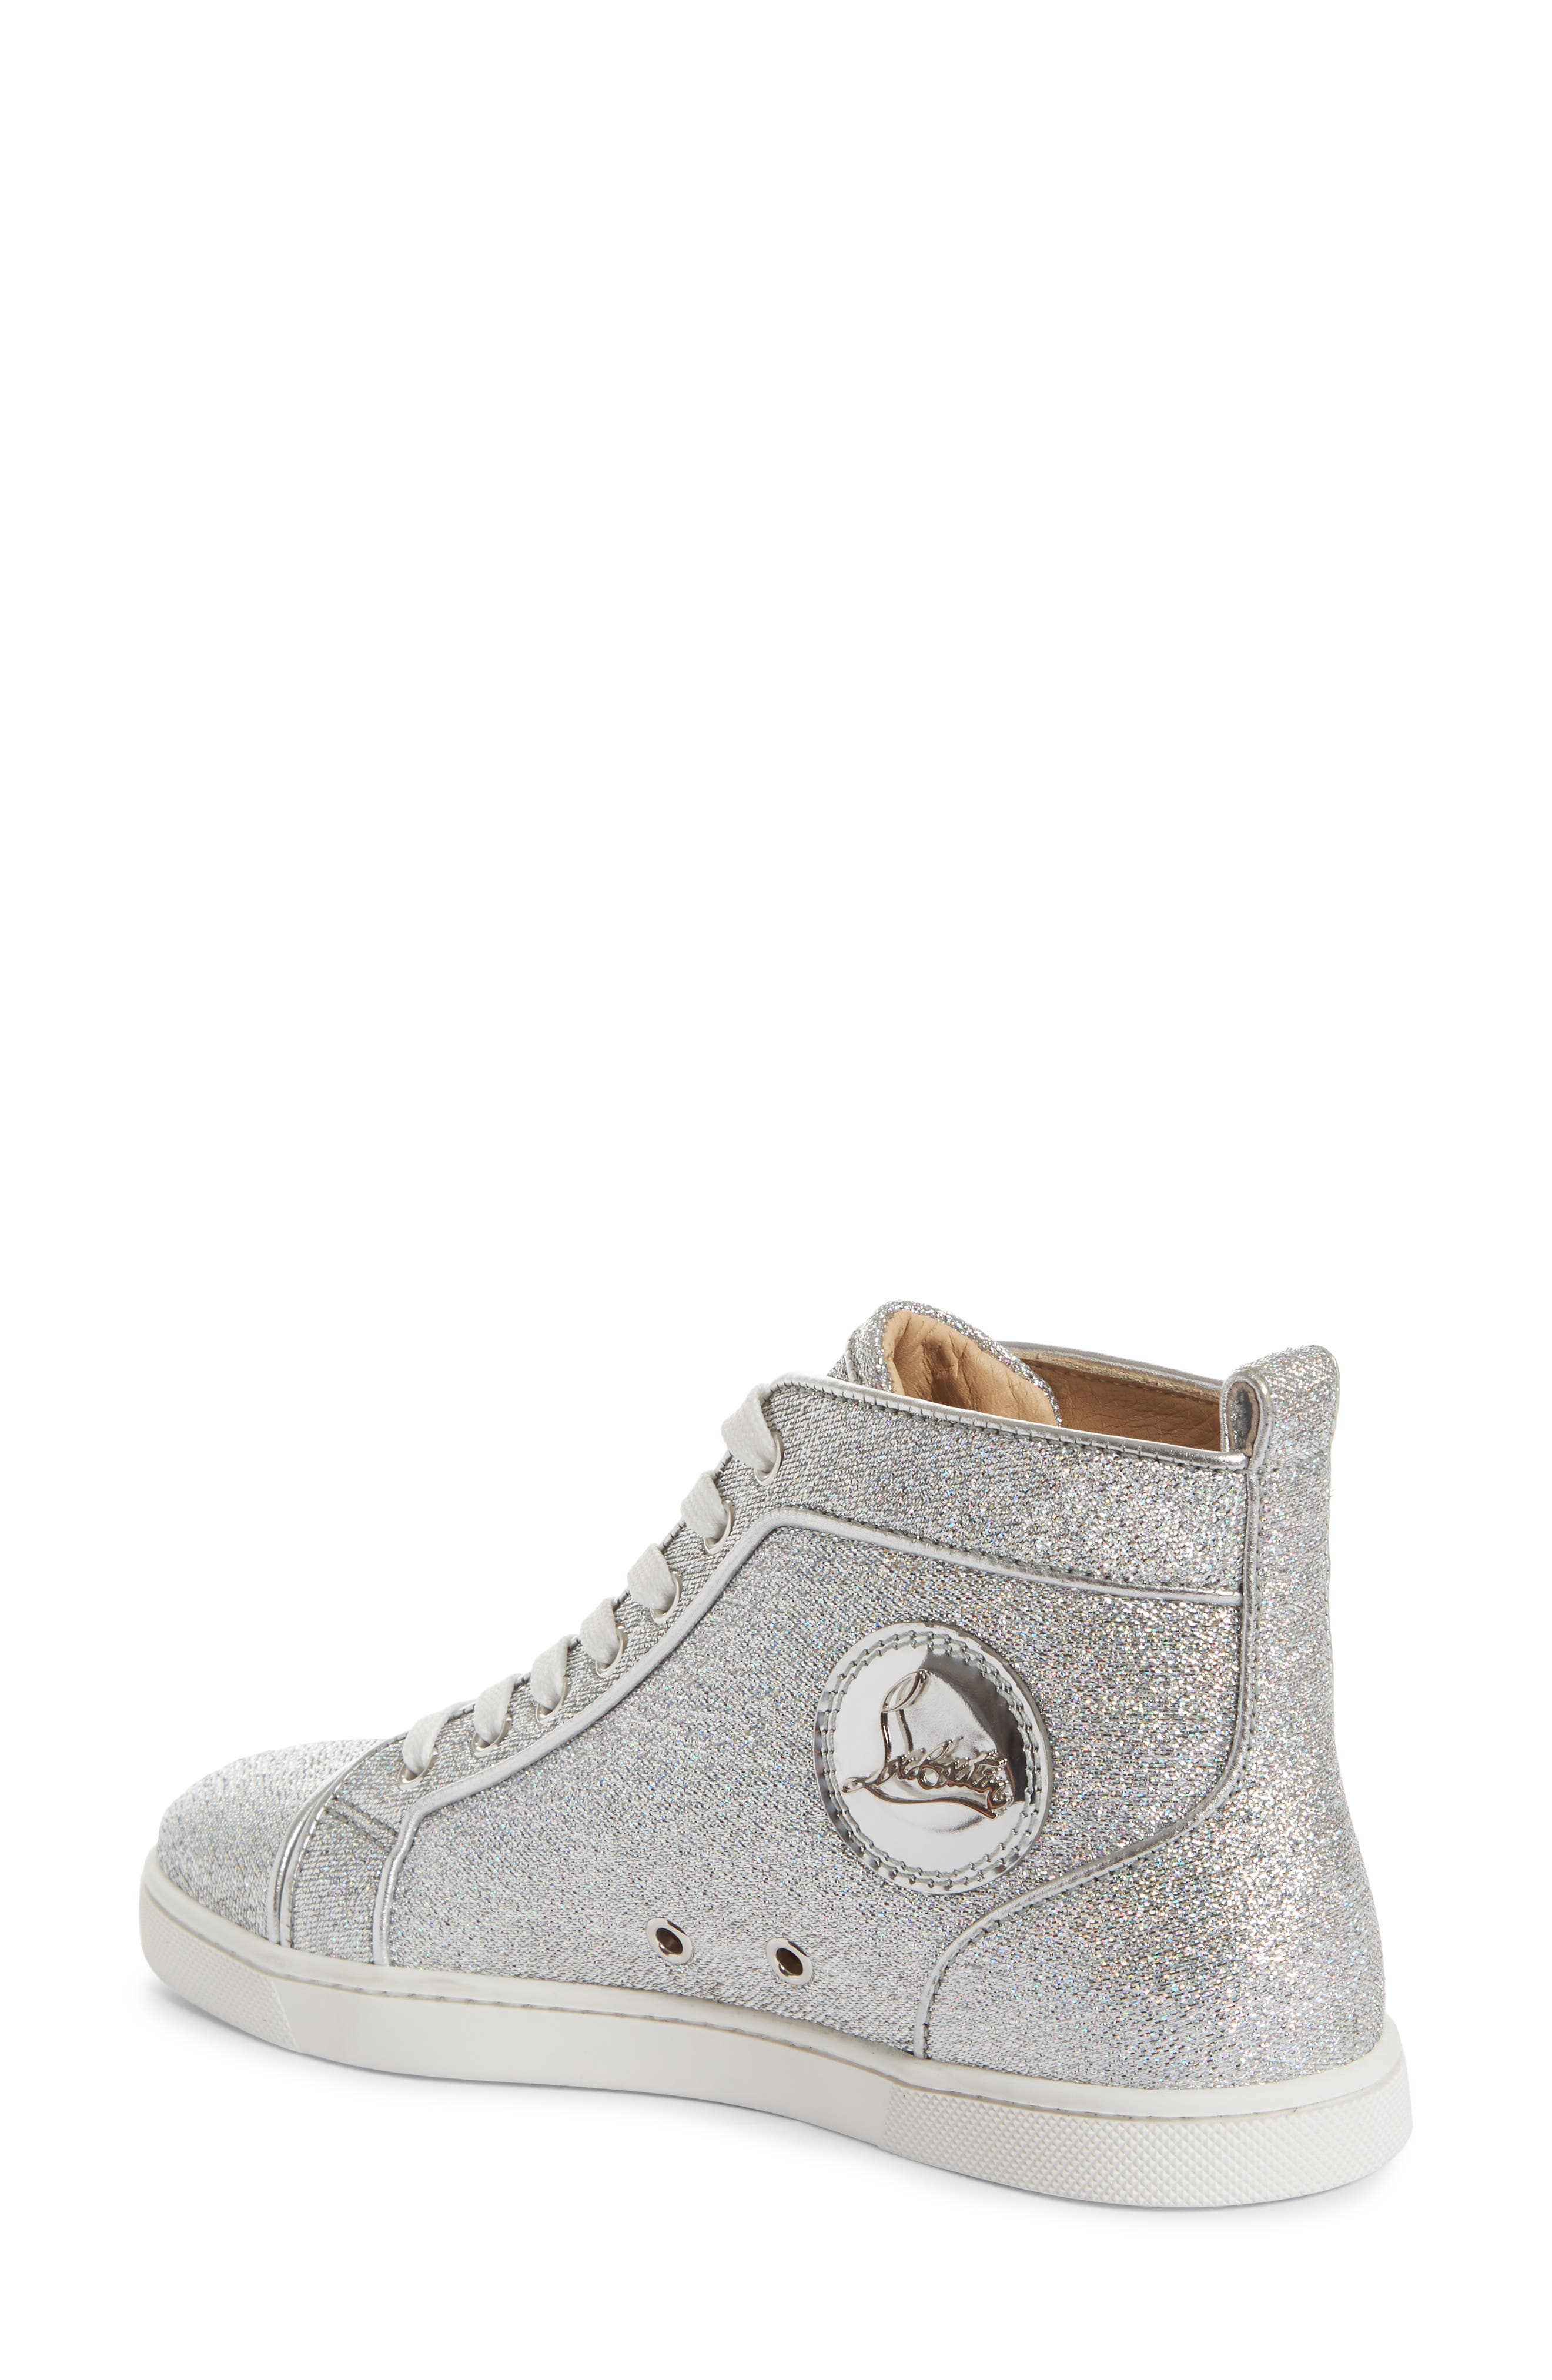 Orlato Metallic High Top Sneaker,                             Alternate thumbnail 2, color,                             040